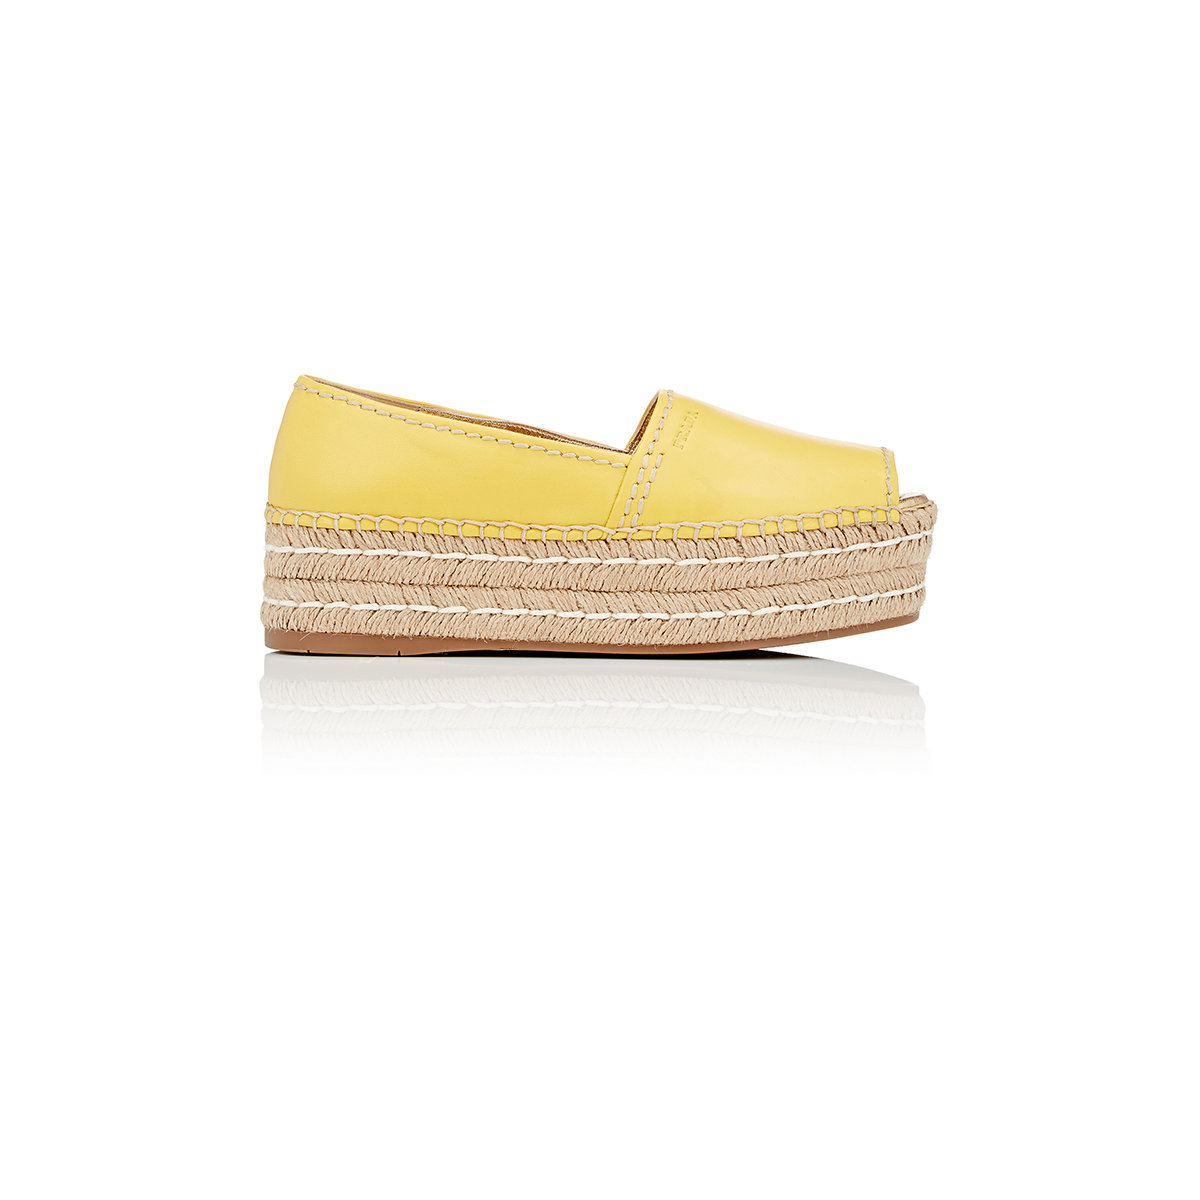 fake prada mens sunglasses - Prada Women's Open-toe Platform Espadrilles in Yellow | Lyst